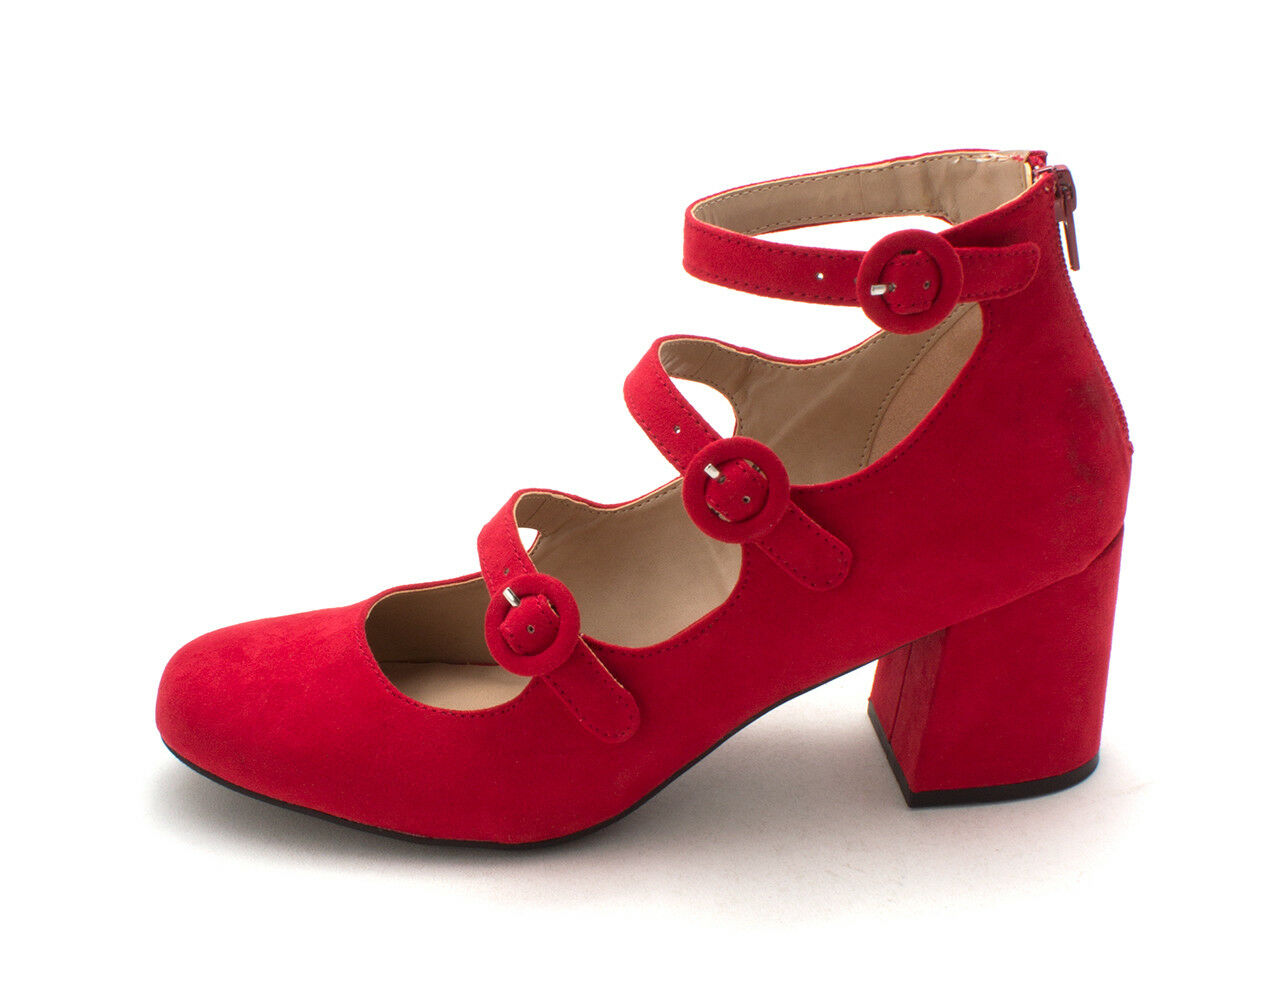 Mix Closed No 6 Damenschuhe deima Closed Mix Toe Casual Ankle Strap Sandales  ROT  Größe 10.0 c85e38